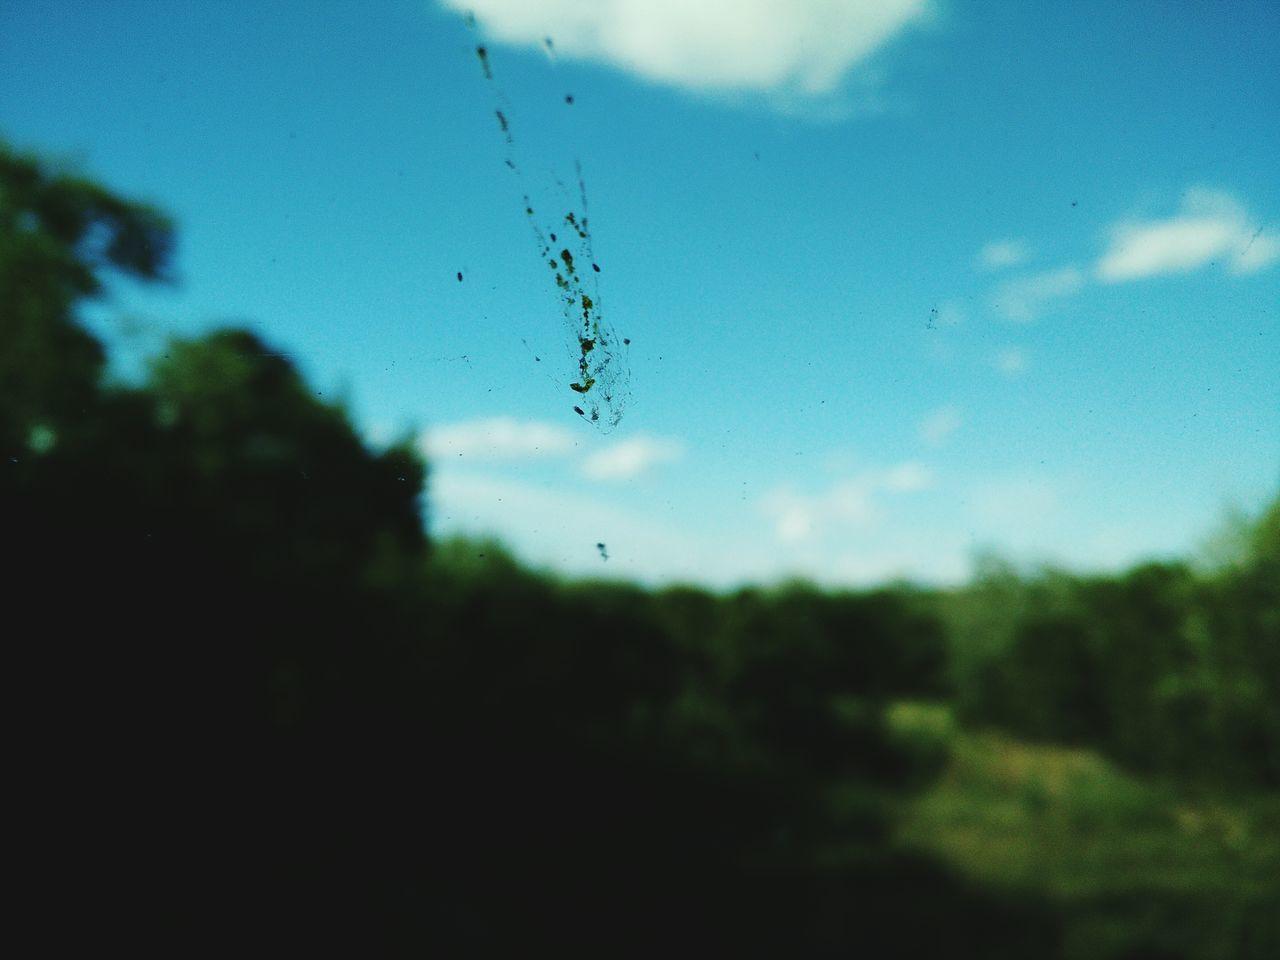 Splat Bug Bug On Windhield Macro Photography Mobilephotography Oneplus One Memories Roadtrip Pastel Power